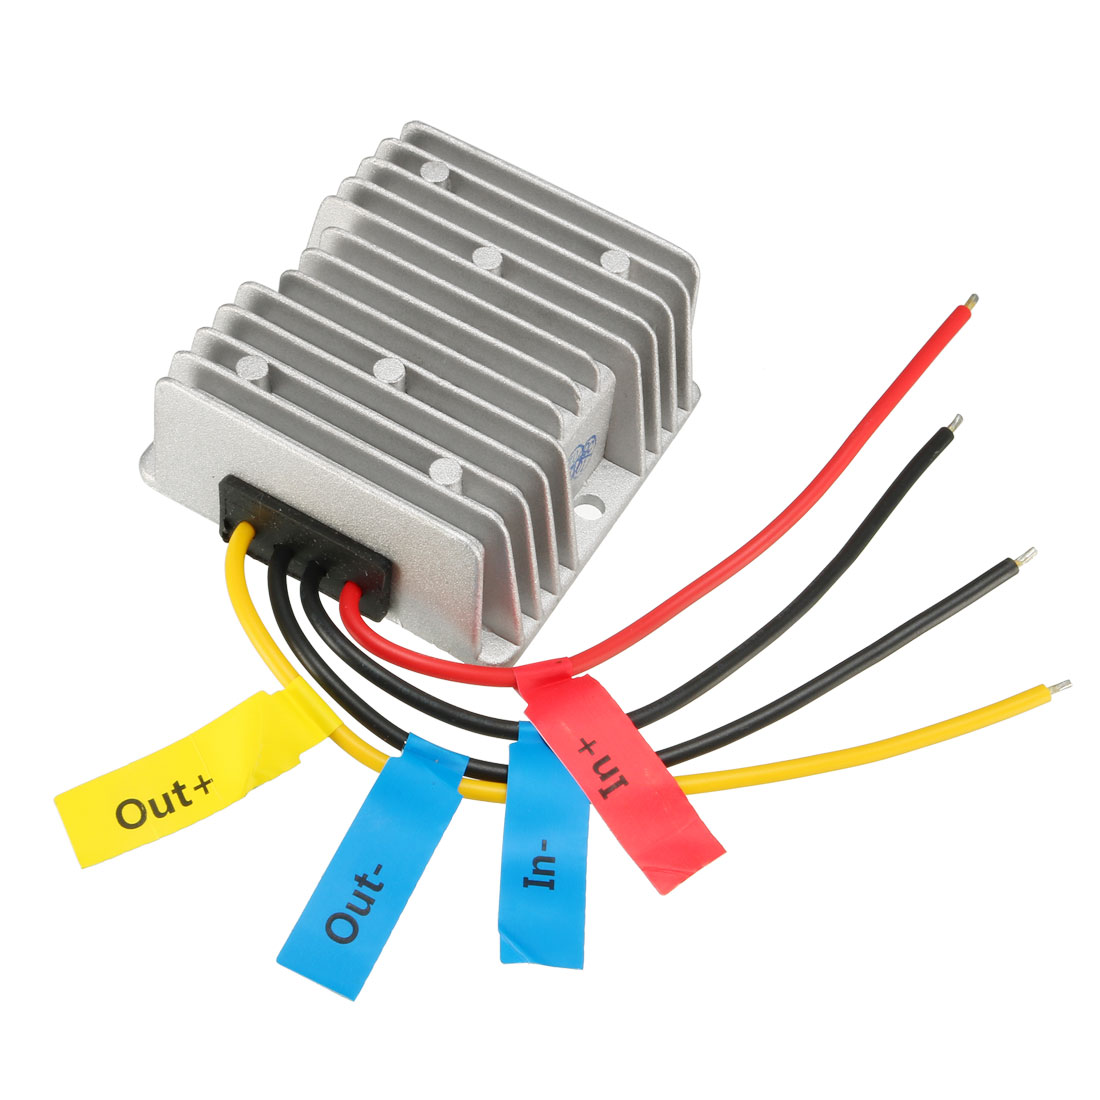 uxcell Voltage Converter Regulator DC/DC DC 10-32V to DC 12V 6A 72W Step Down/Up Transformer Waterproof